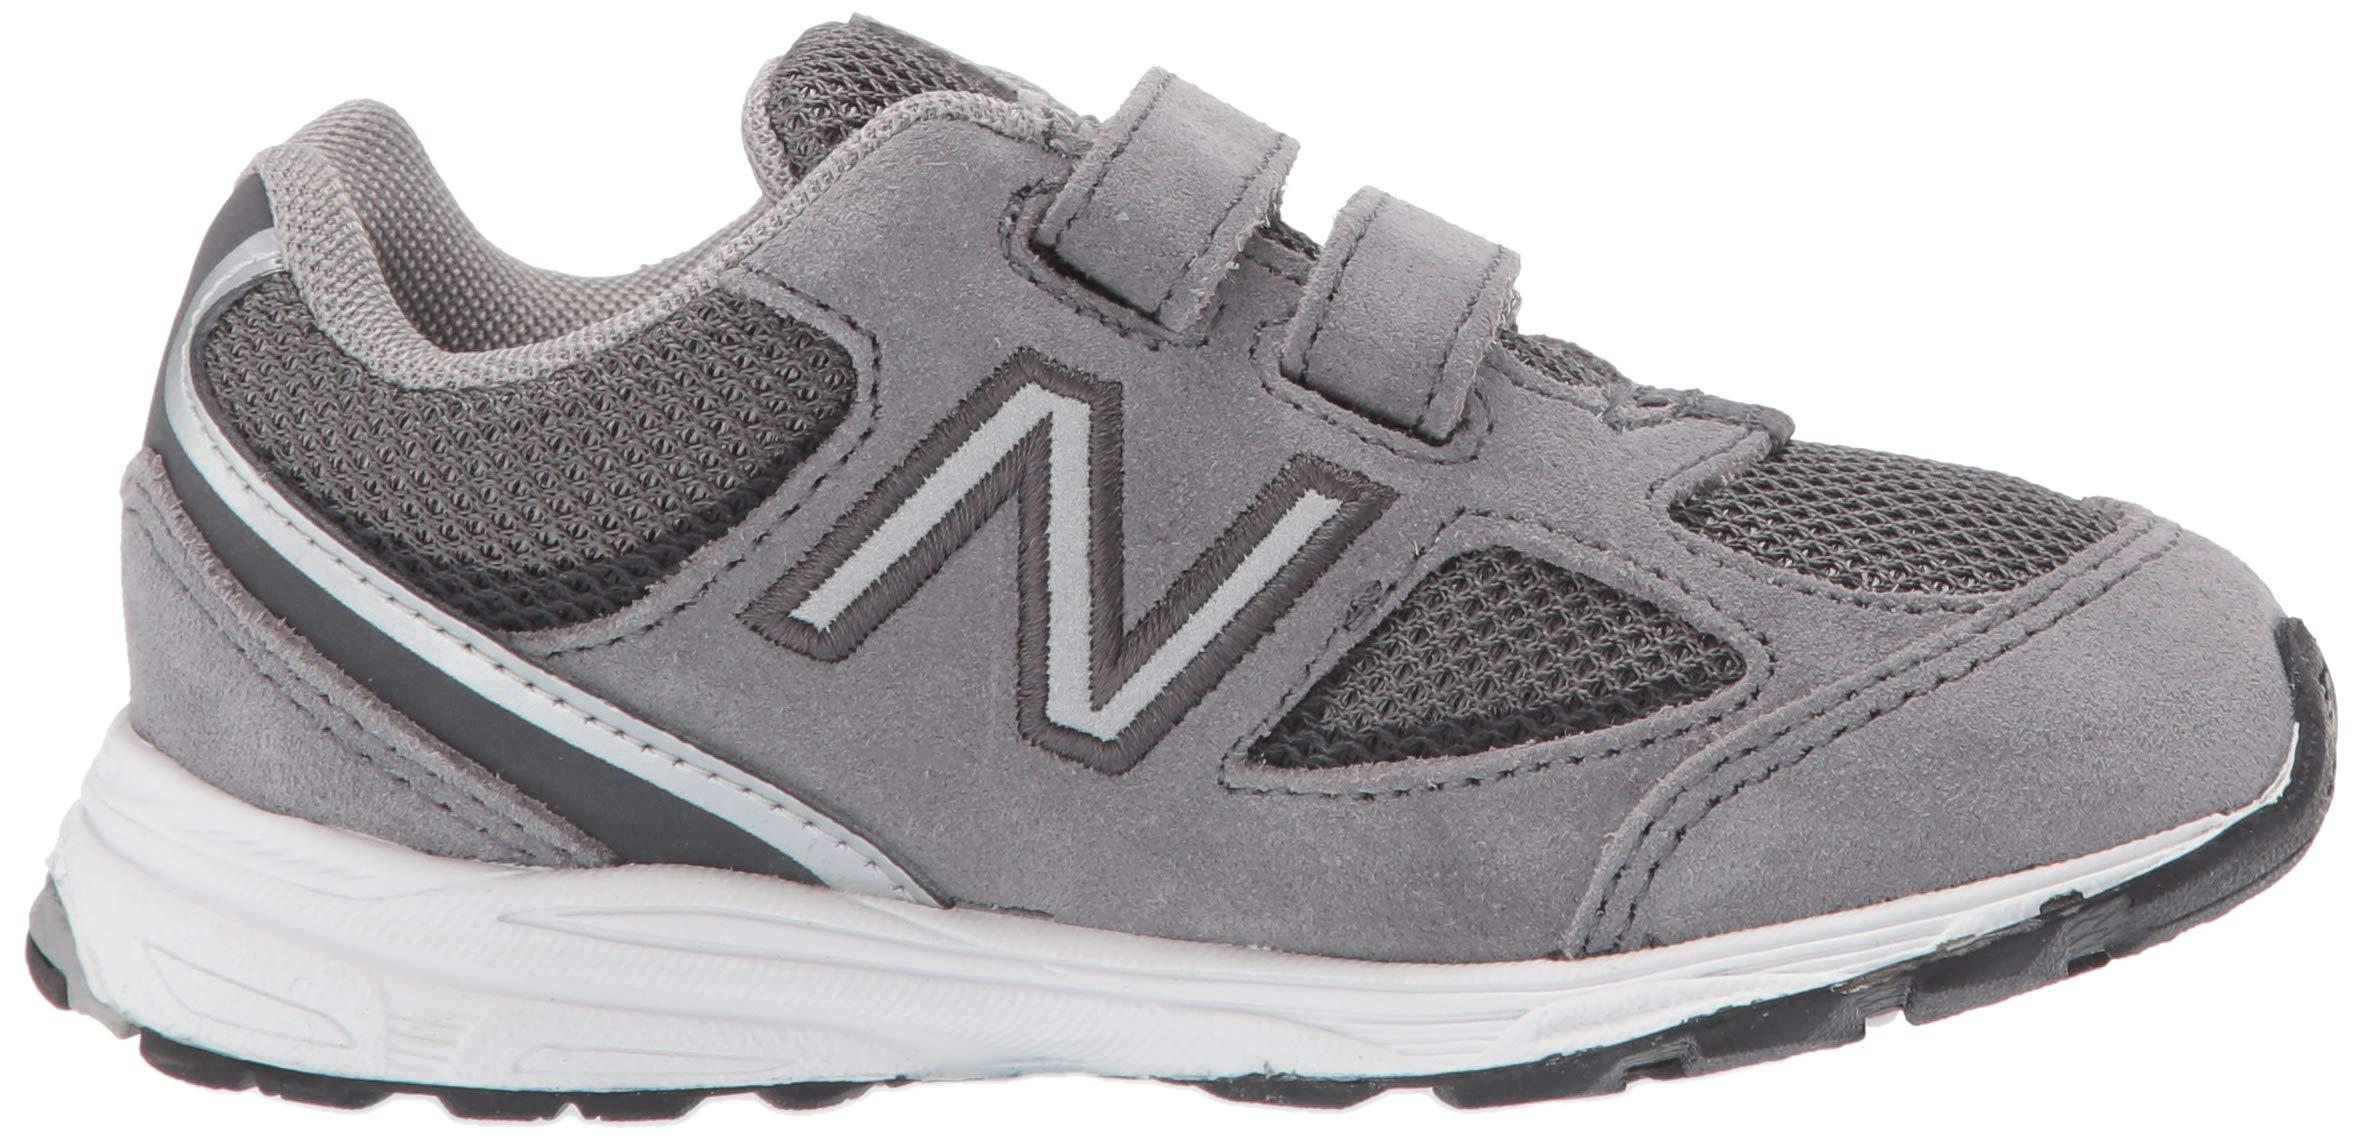 New Balance Boys' 888v2 Hook and Loop Running Shoe, Dark Grey, 2 M US Infant by New Balance (Image #6)